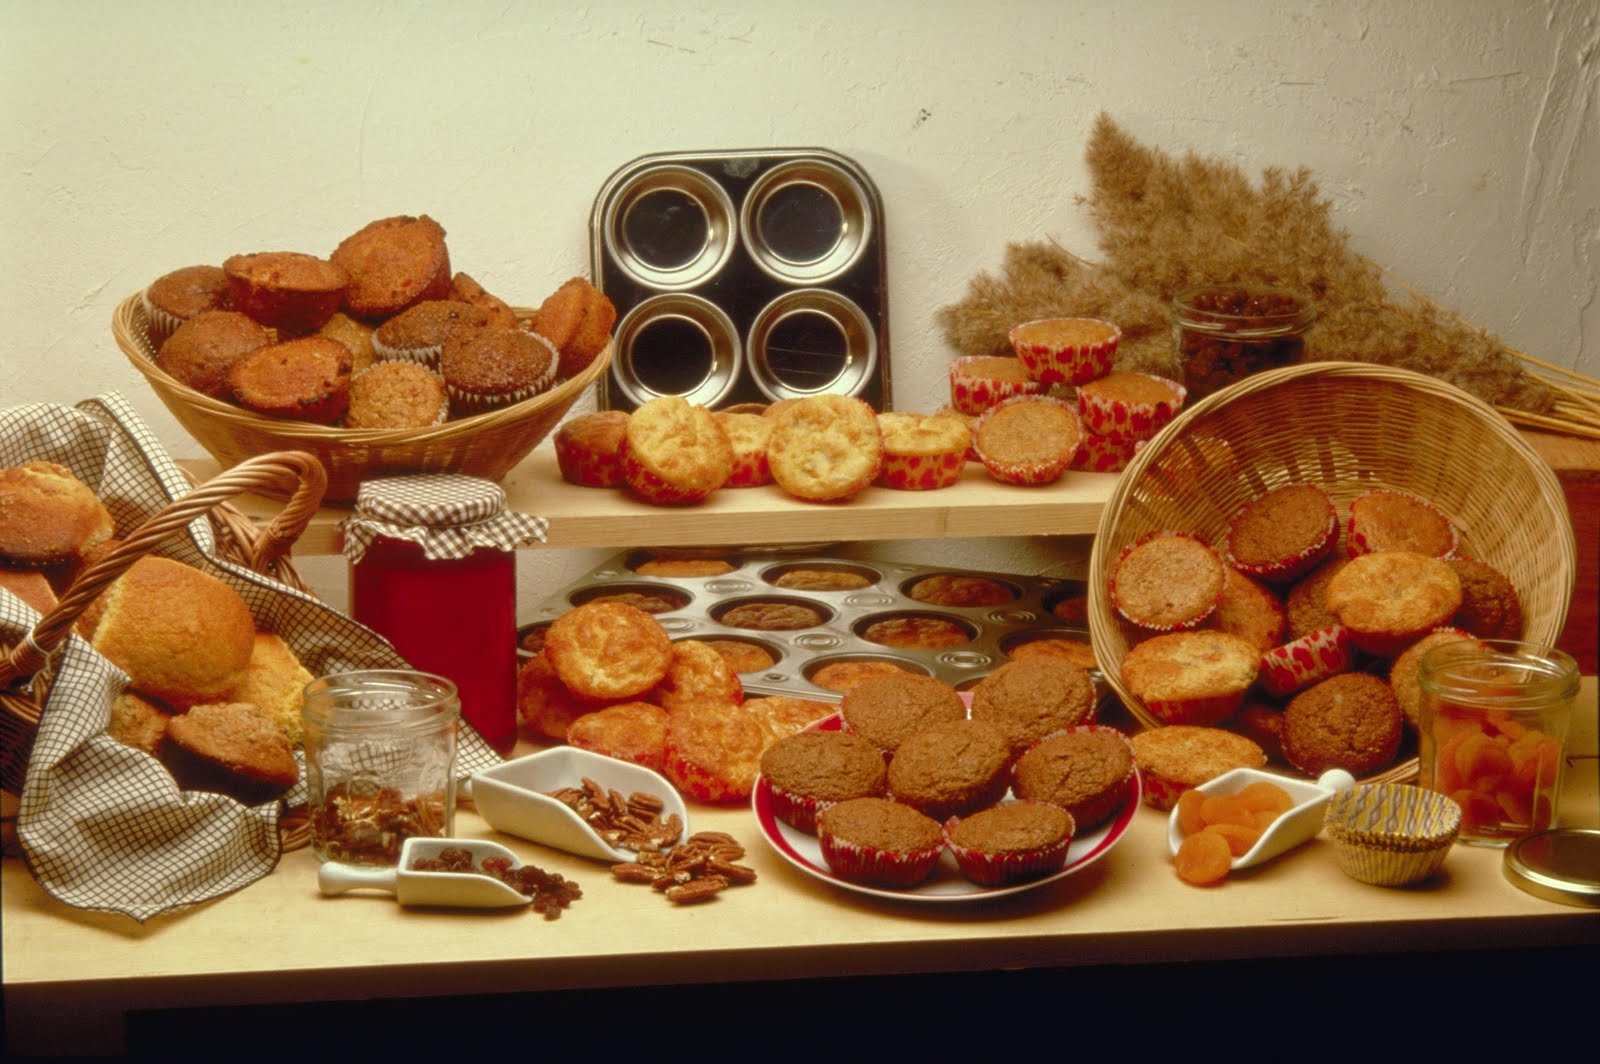 5 Fakta Titin, Penderita Obesitas 300 Kg di Palangkaraya